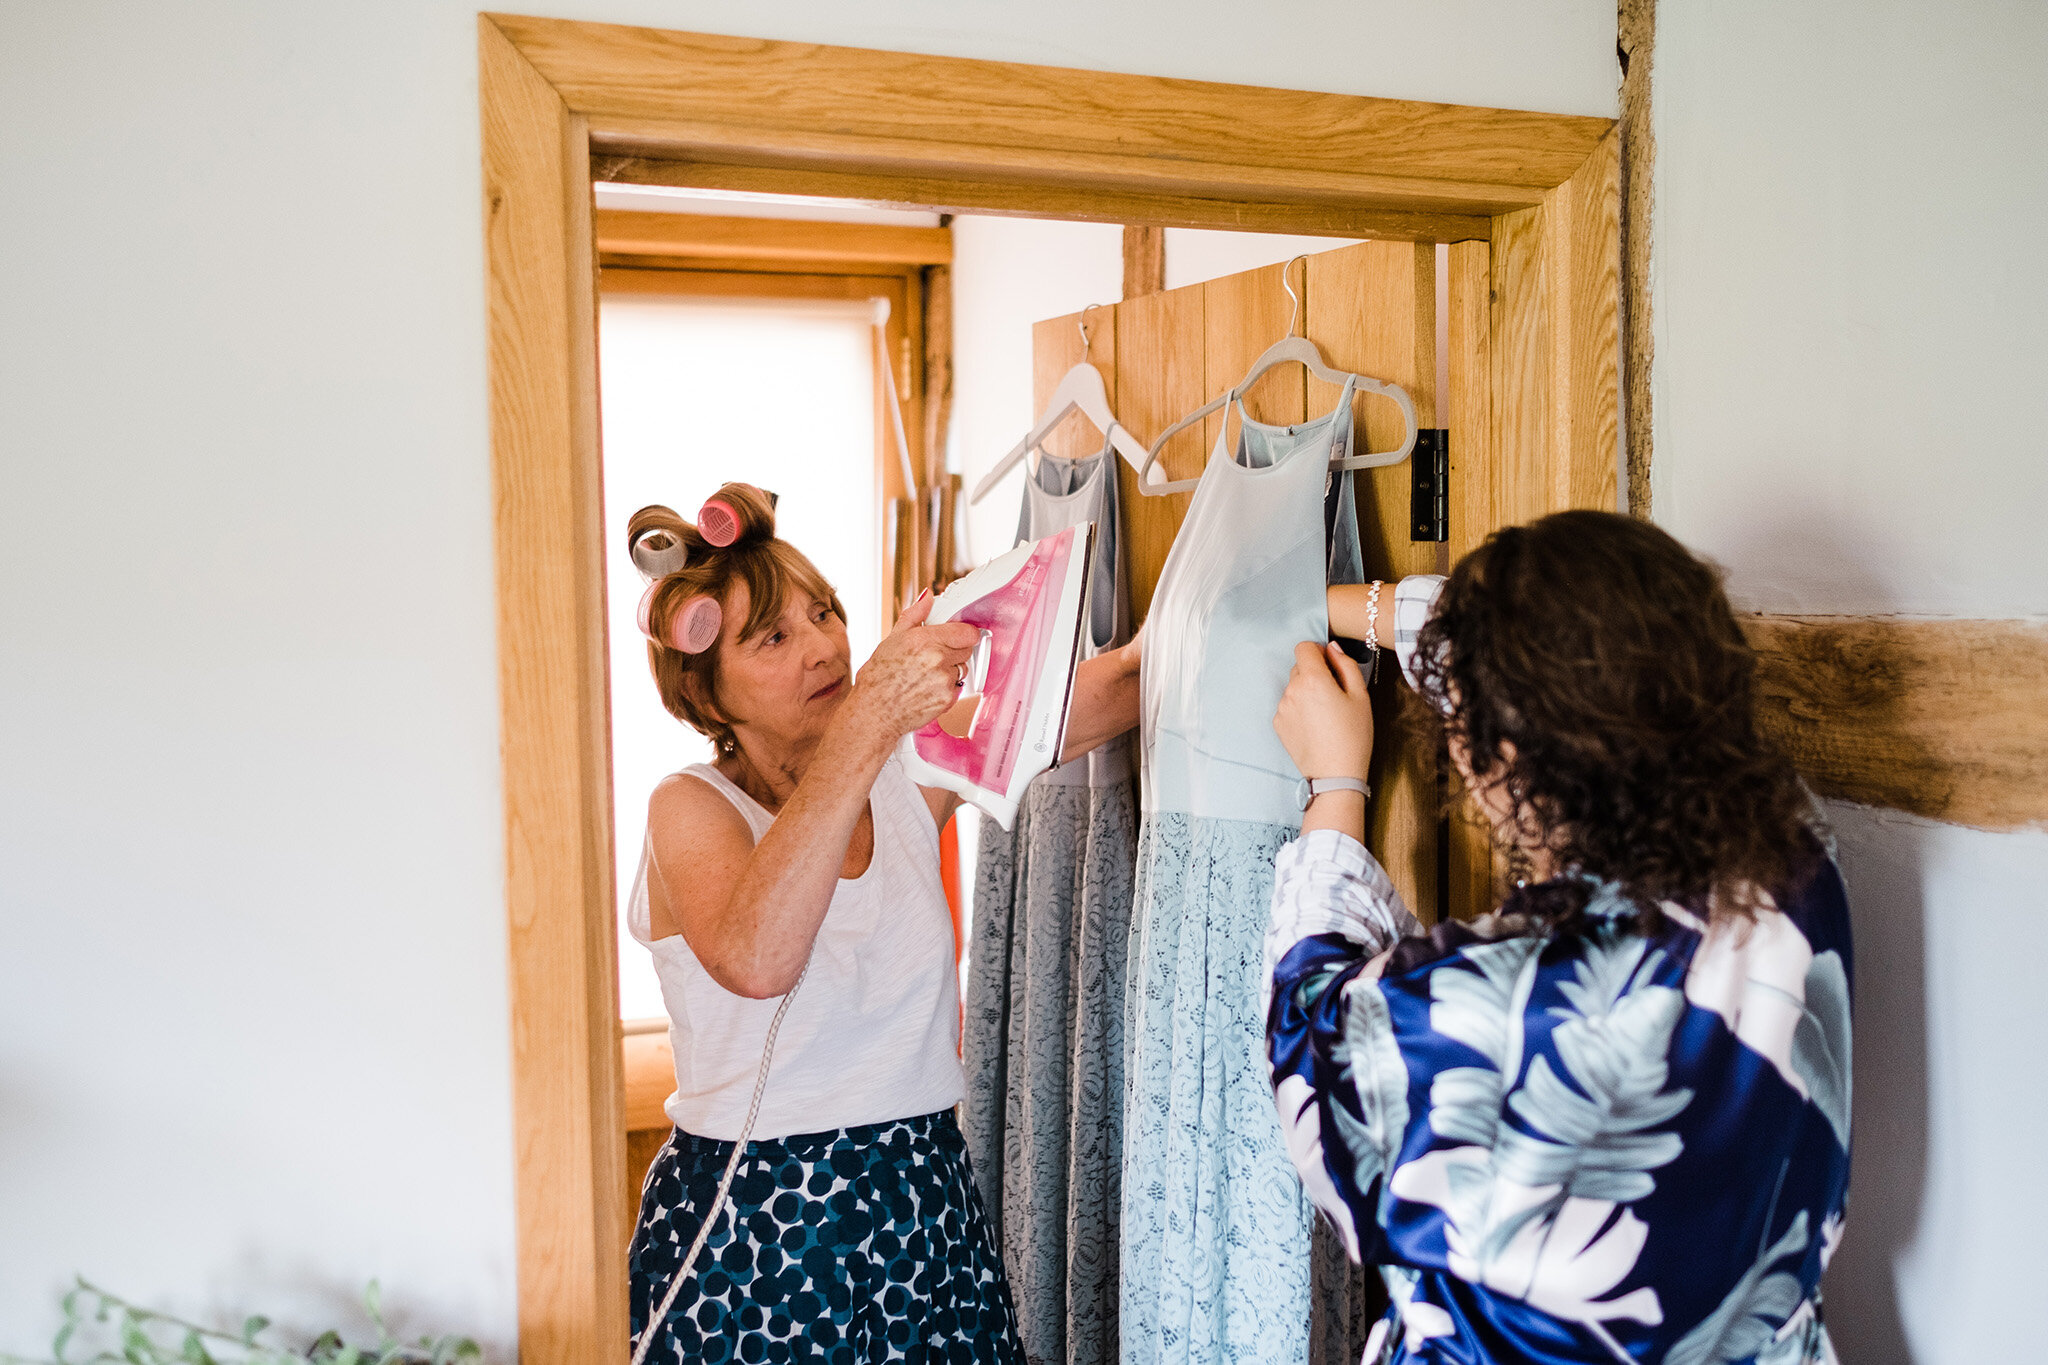 Scott-Stockwell-Photography-wedding-photographer-tim-alice-mum-ironing.jpg